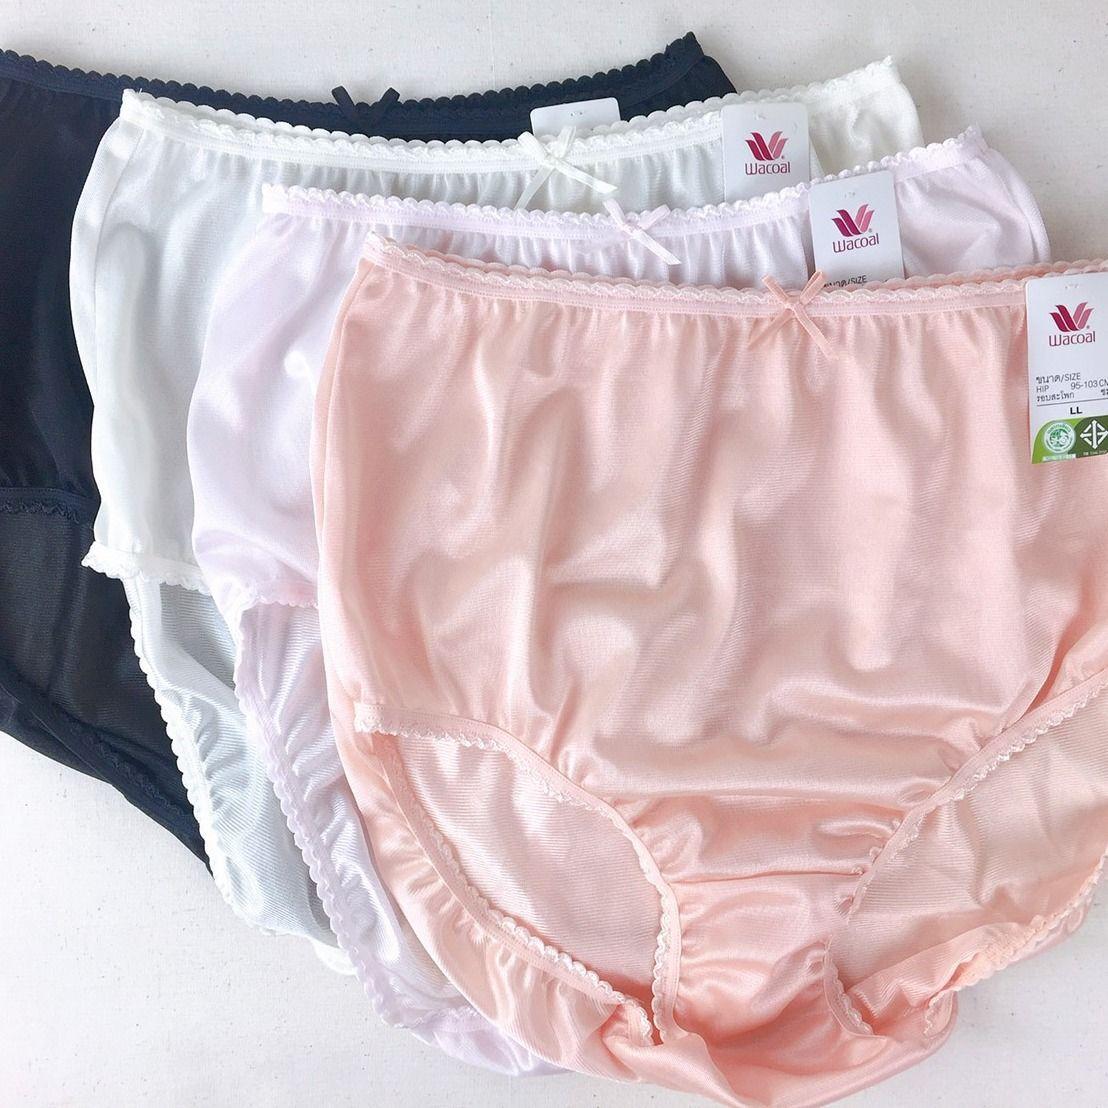 Pink Vtg Granny panties sz 8 Cotton Vintage Lingerie Bloomer